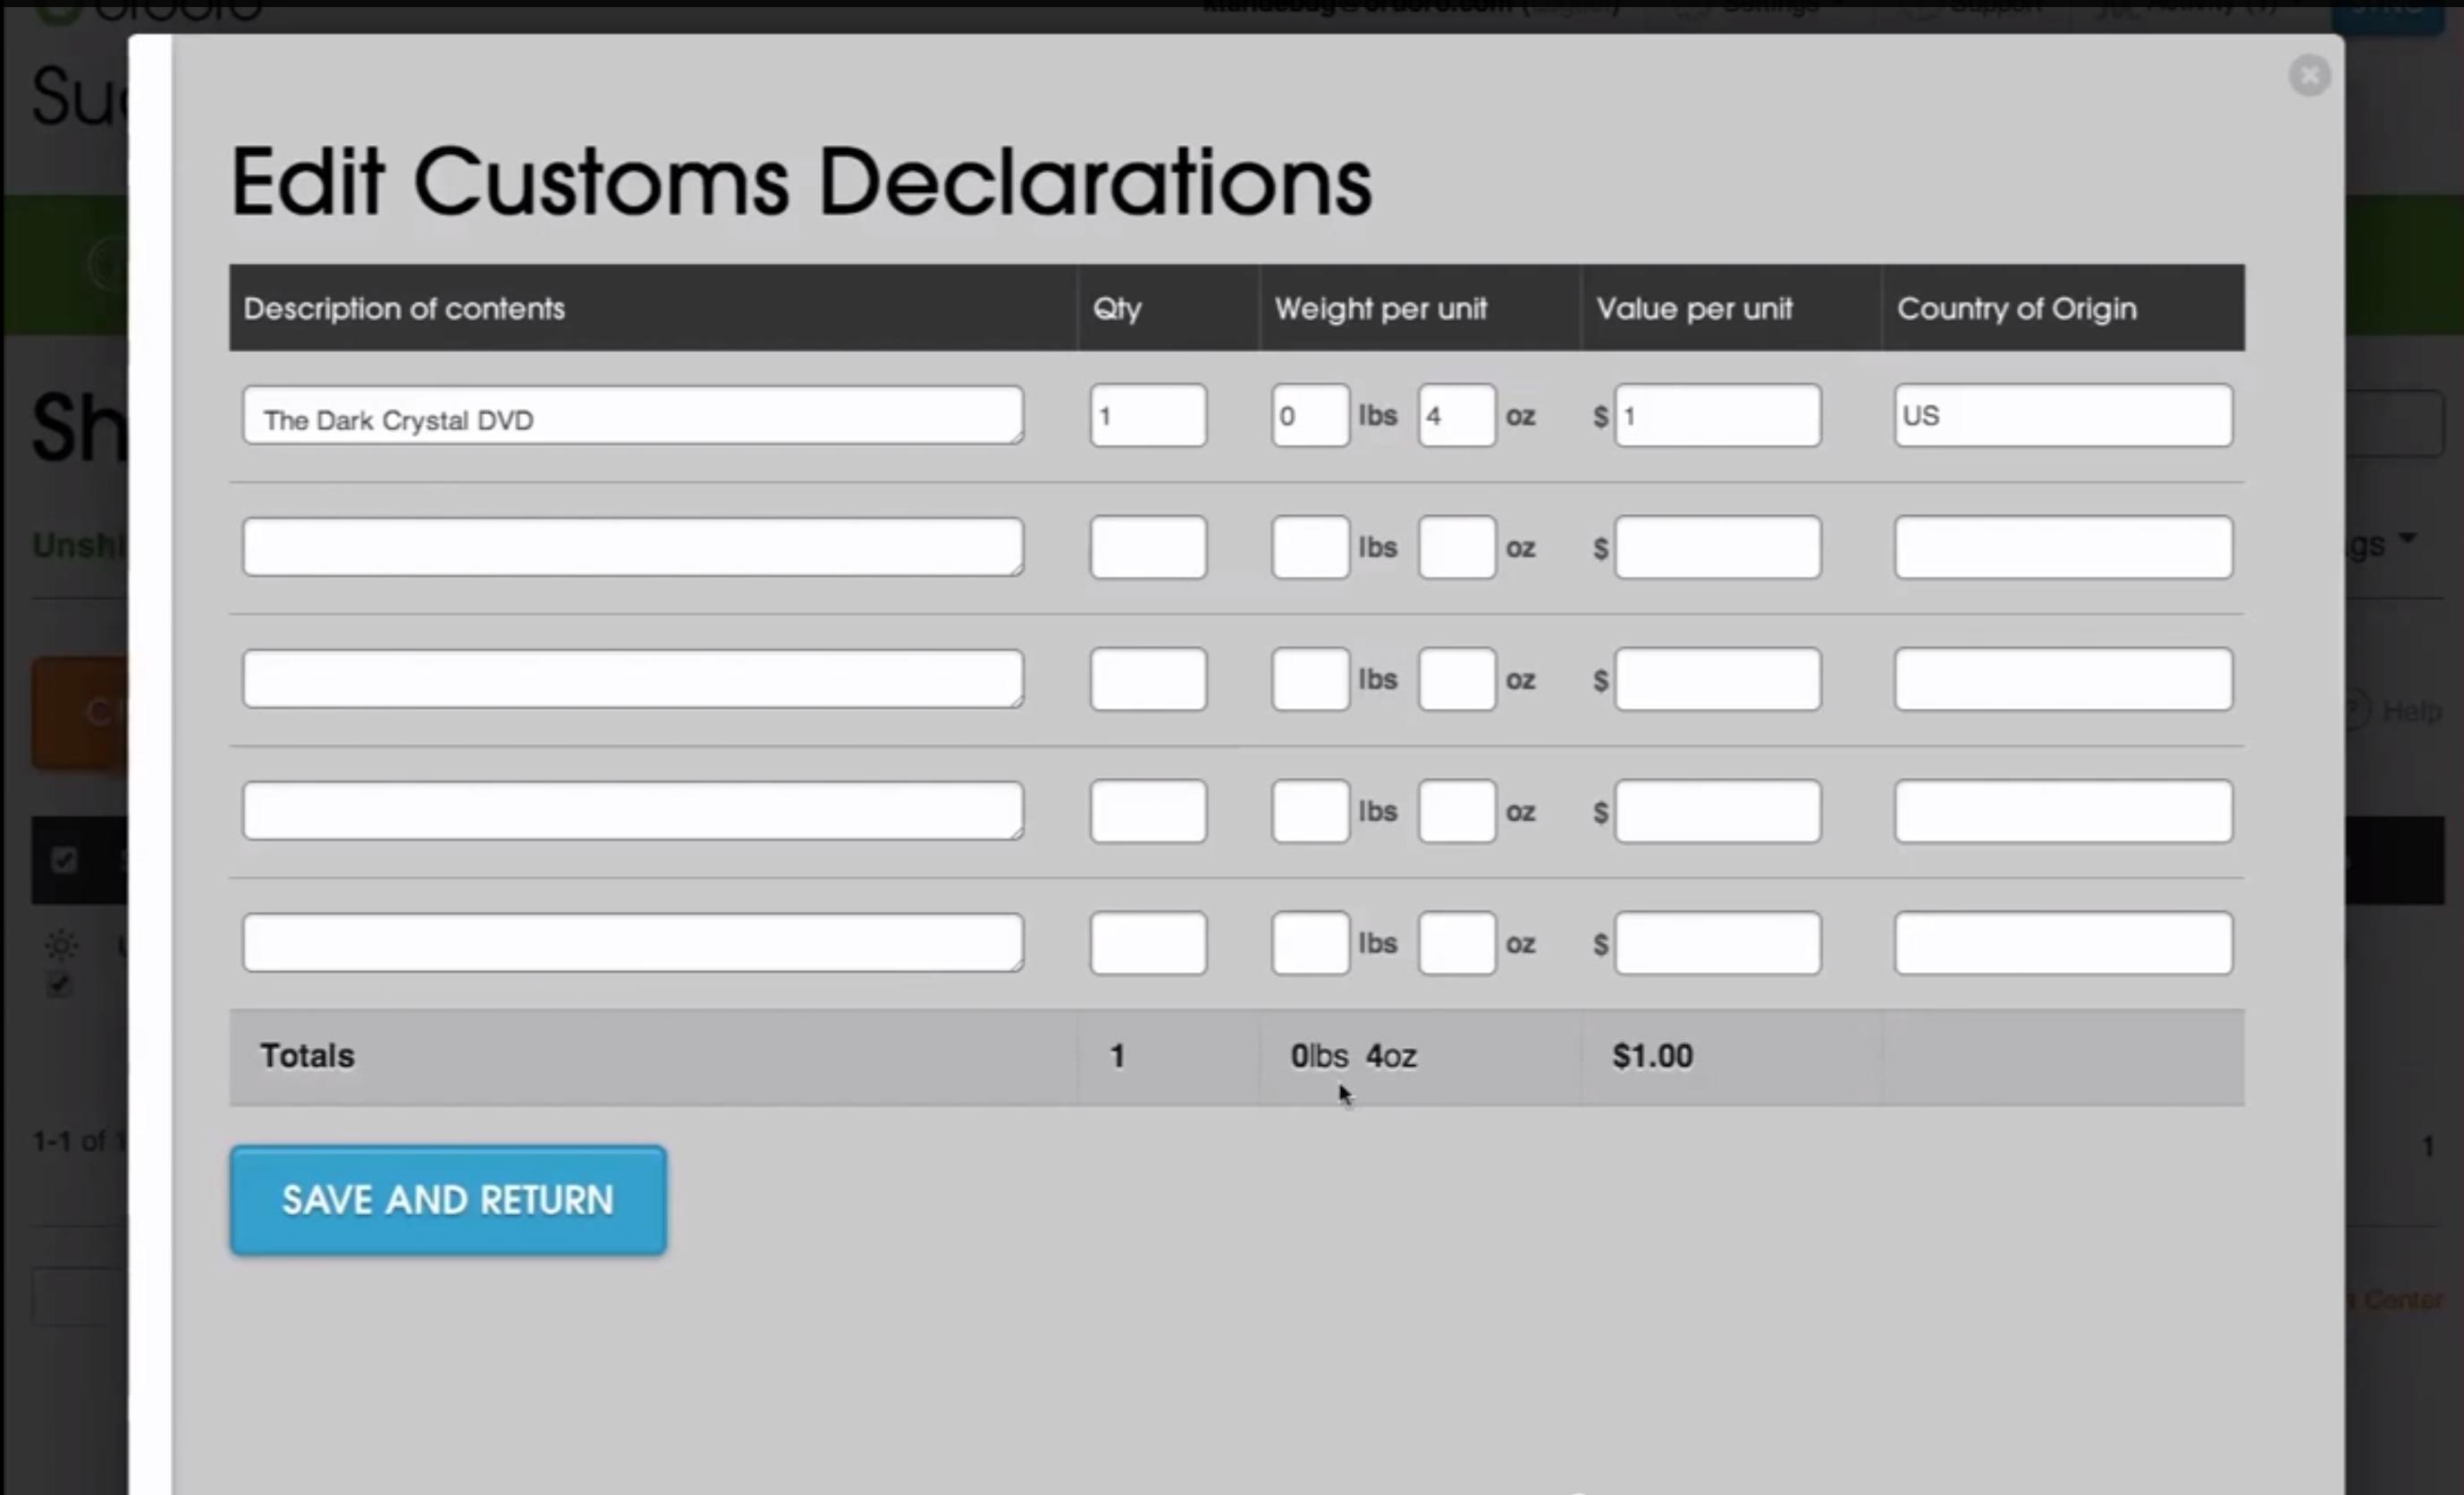 Customs declarations